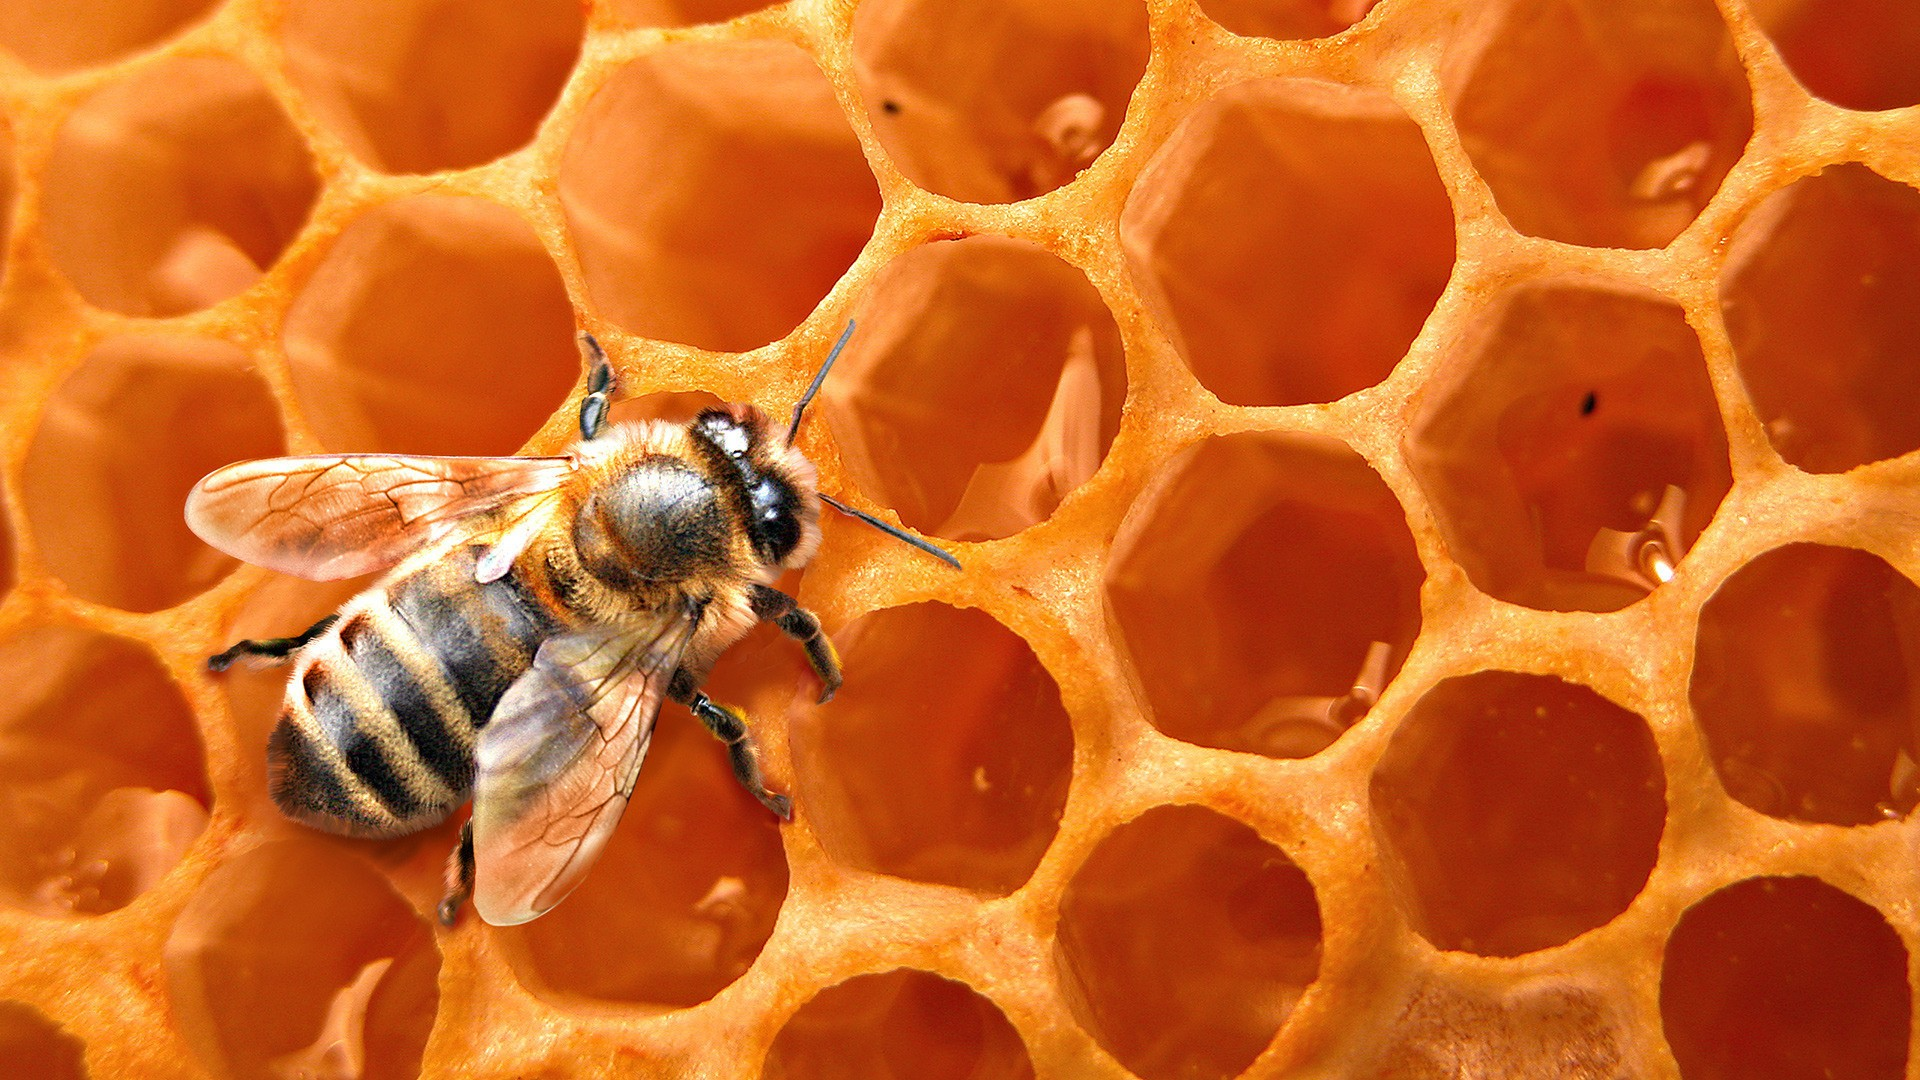 Honey Bees Wallpaper 1920x1080 Honey Bees 1920x1080